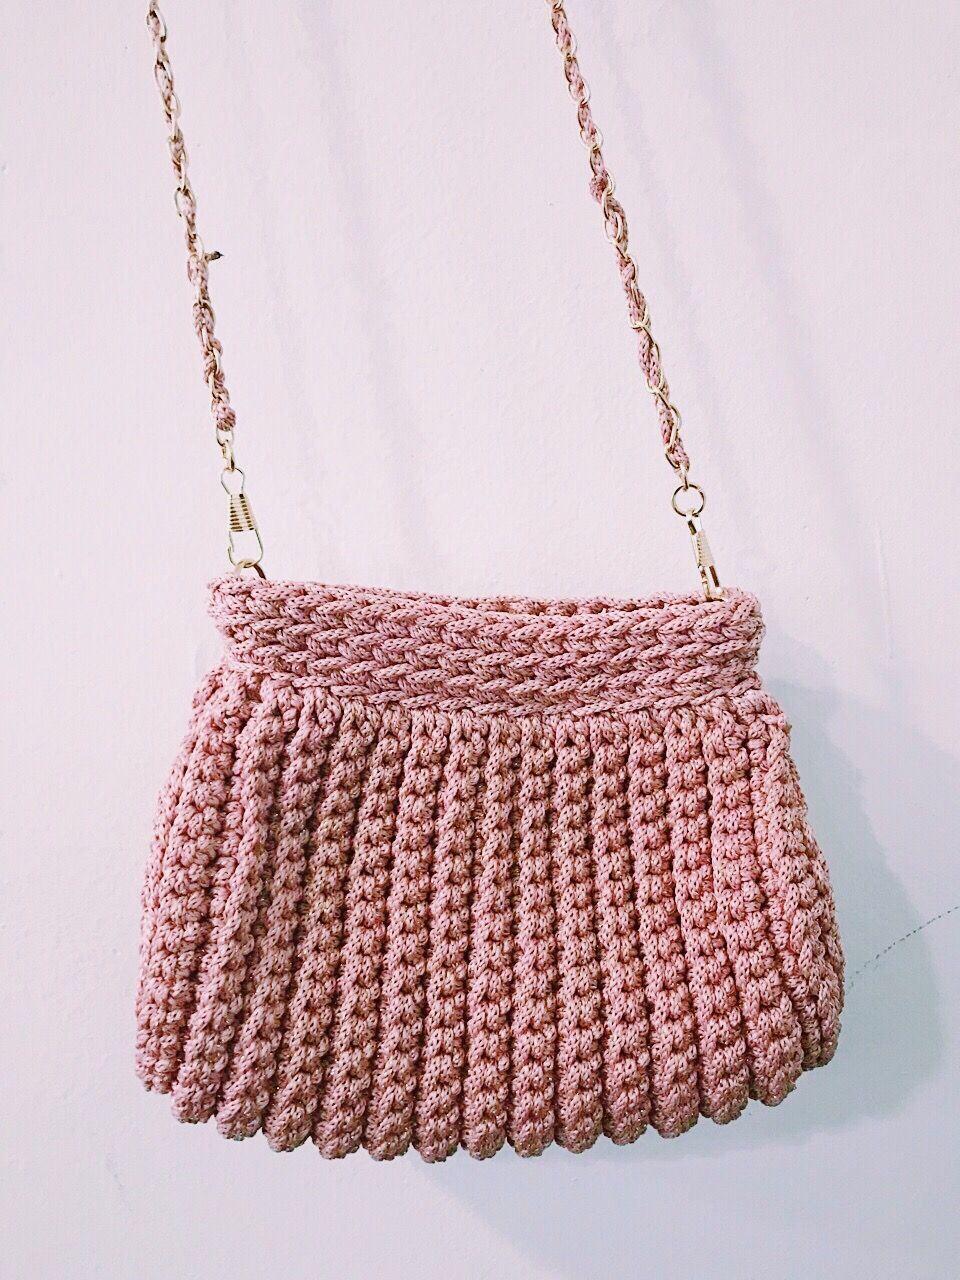 Handmade bag #freetoedit #nìty #crafts #handmade #lovely #bag #pinky